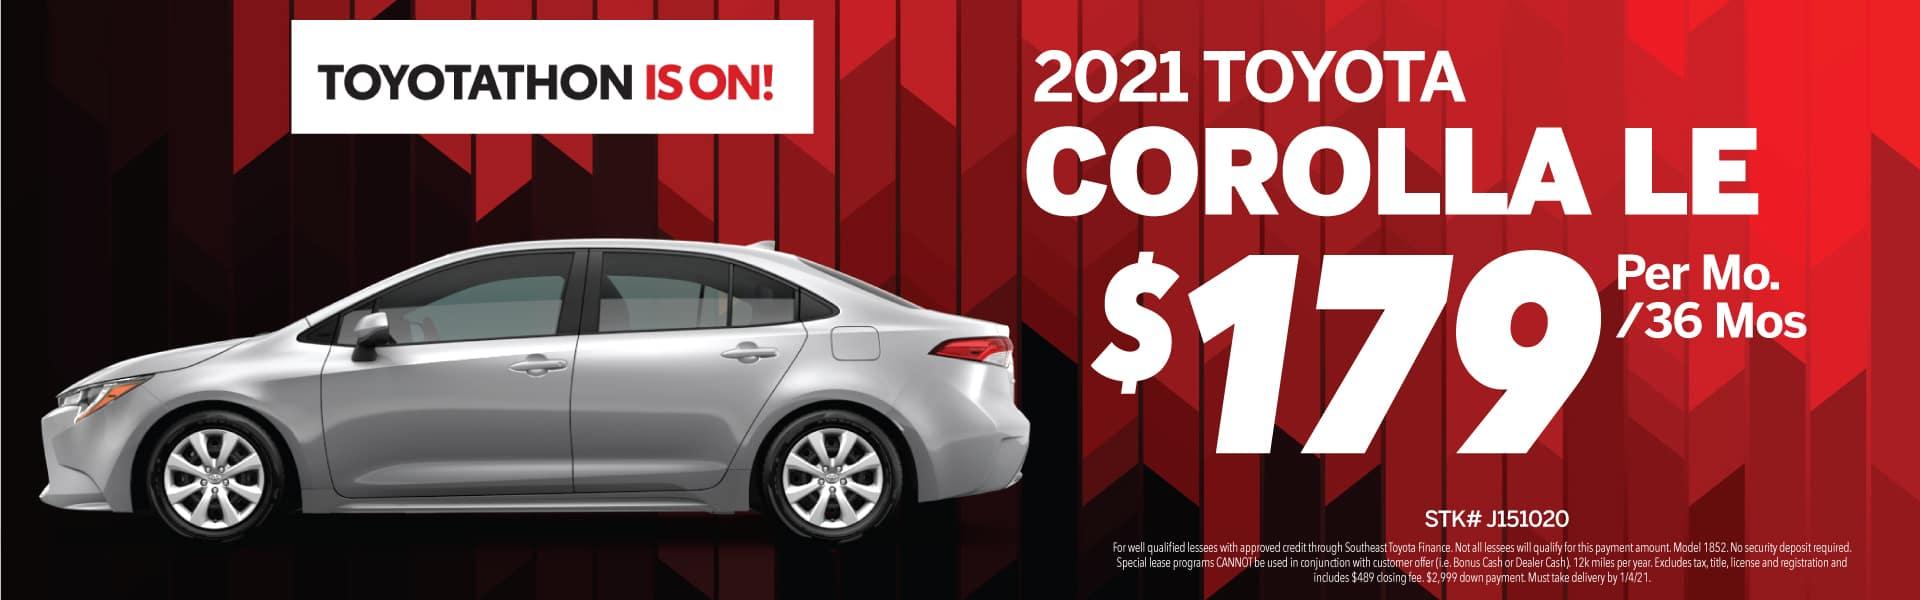 2020 Toyota Corolla Offer